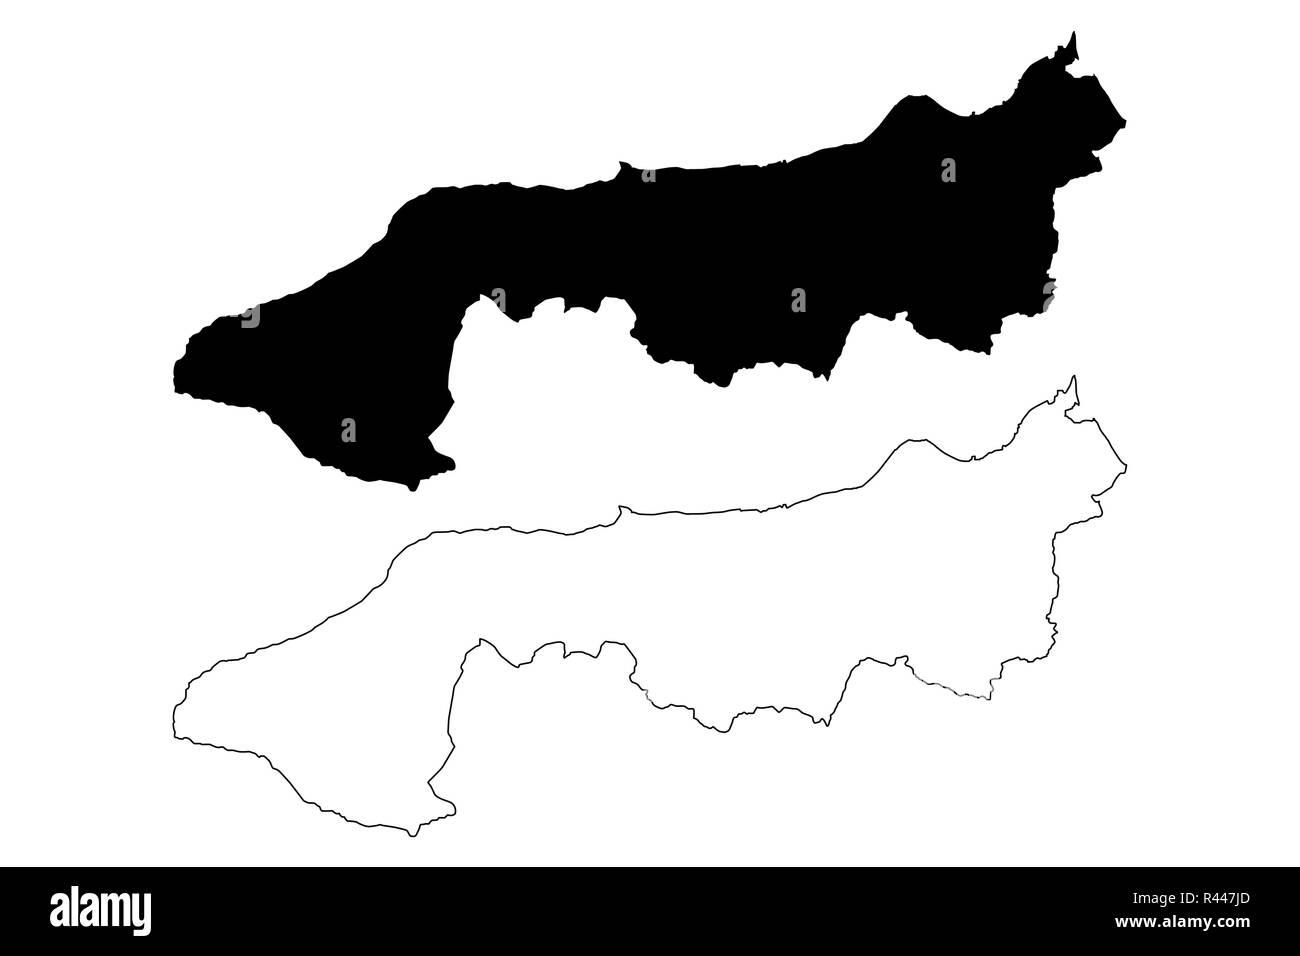 Yalova (Provinces of the Republic of Turkey) map vector illustration, scribble sketch Yalova ili map - Stock Image